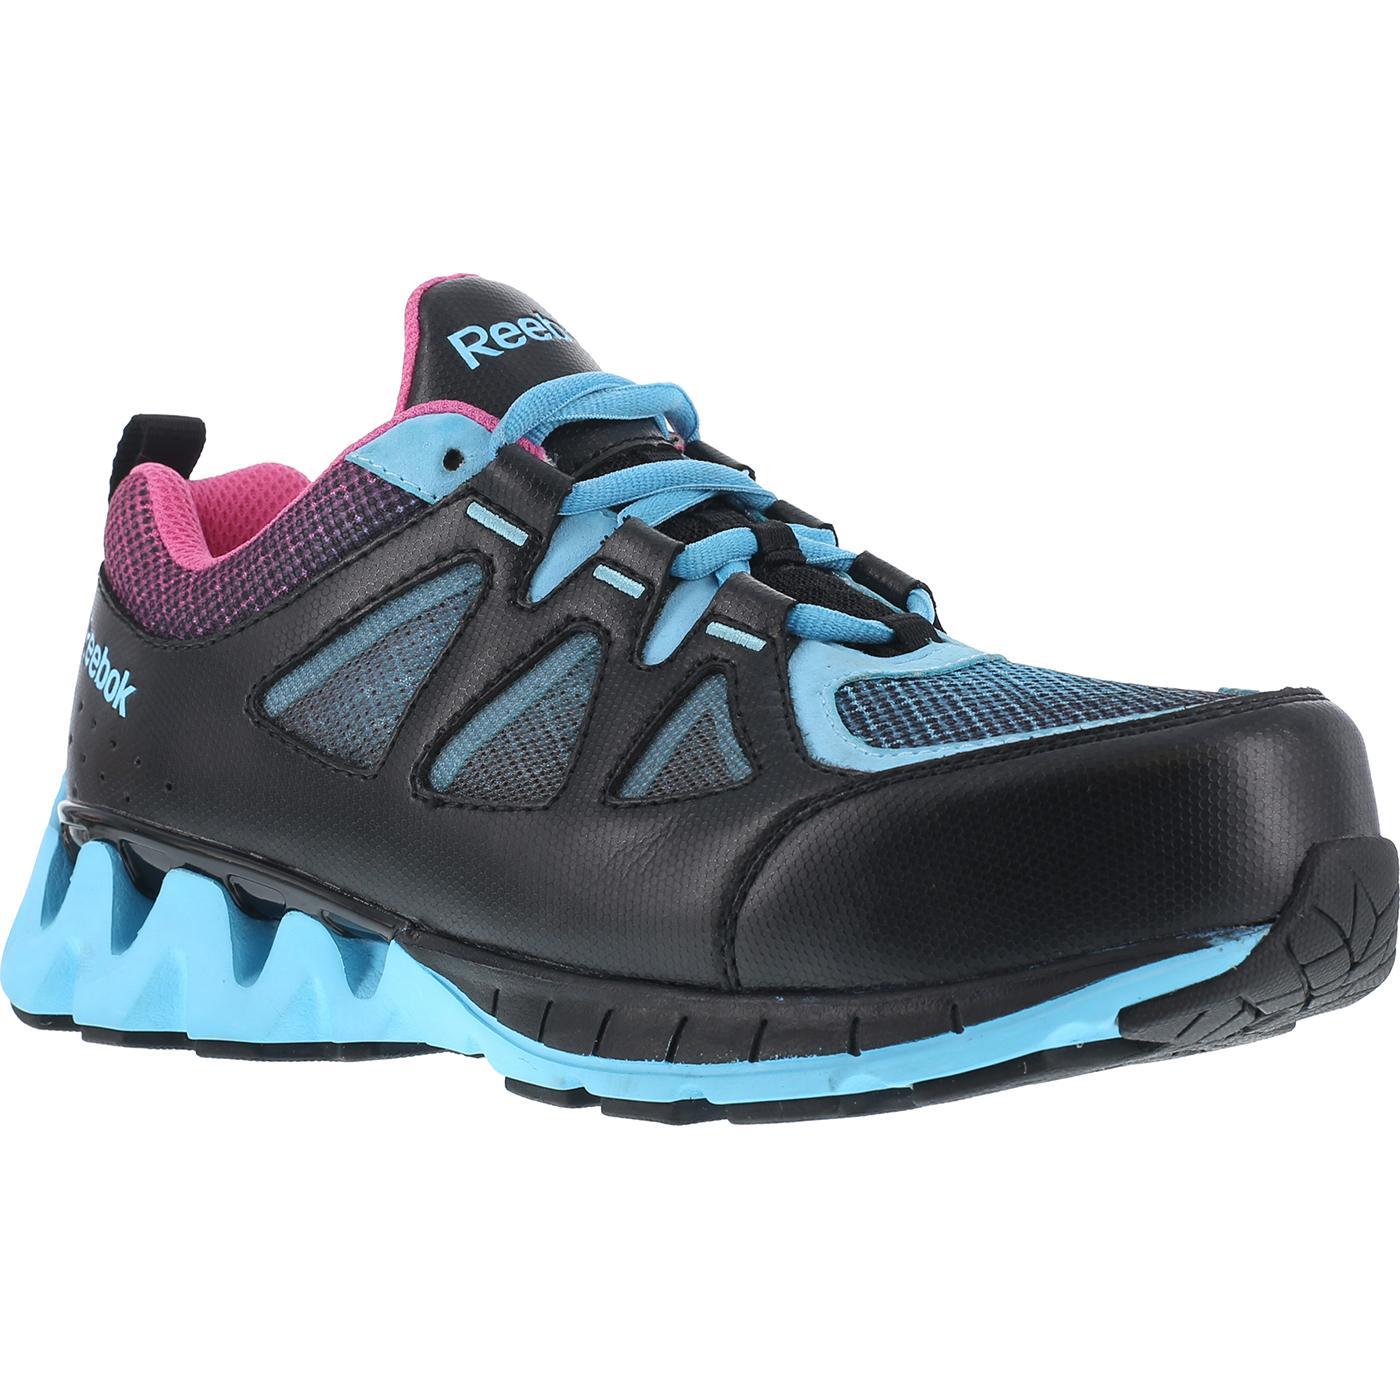 Reebok Zigkick Work Women s Composite Toe Static-Dissipative Work Athletic  Oxford 236741748